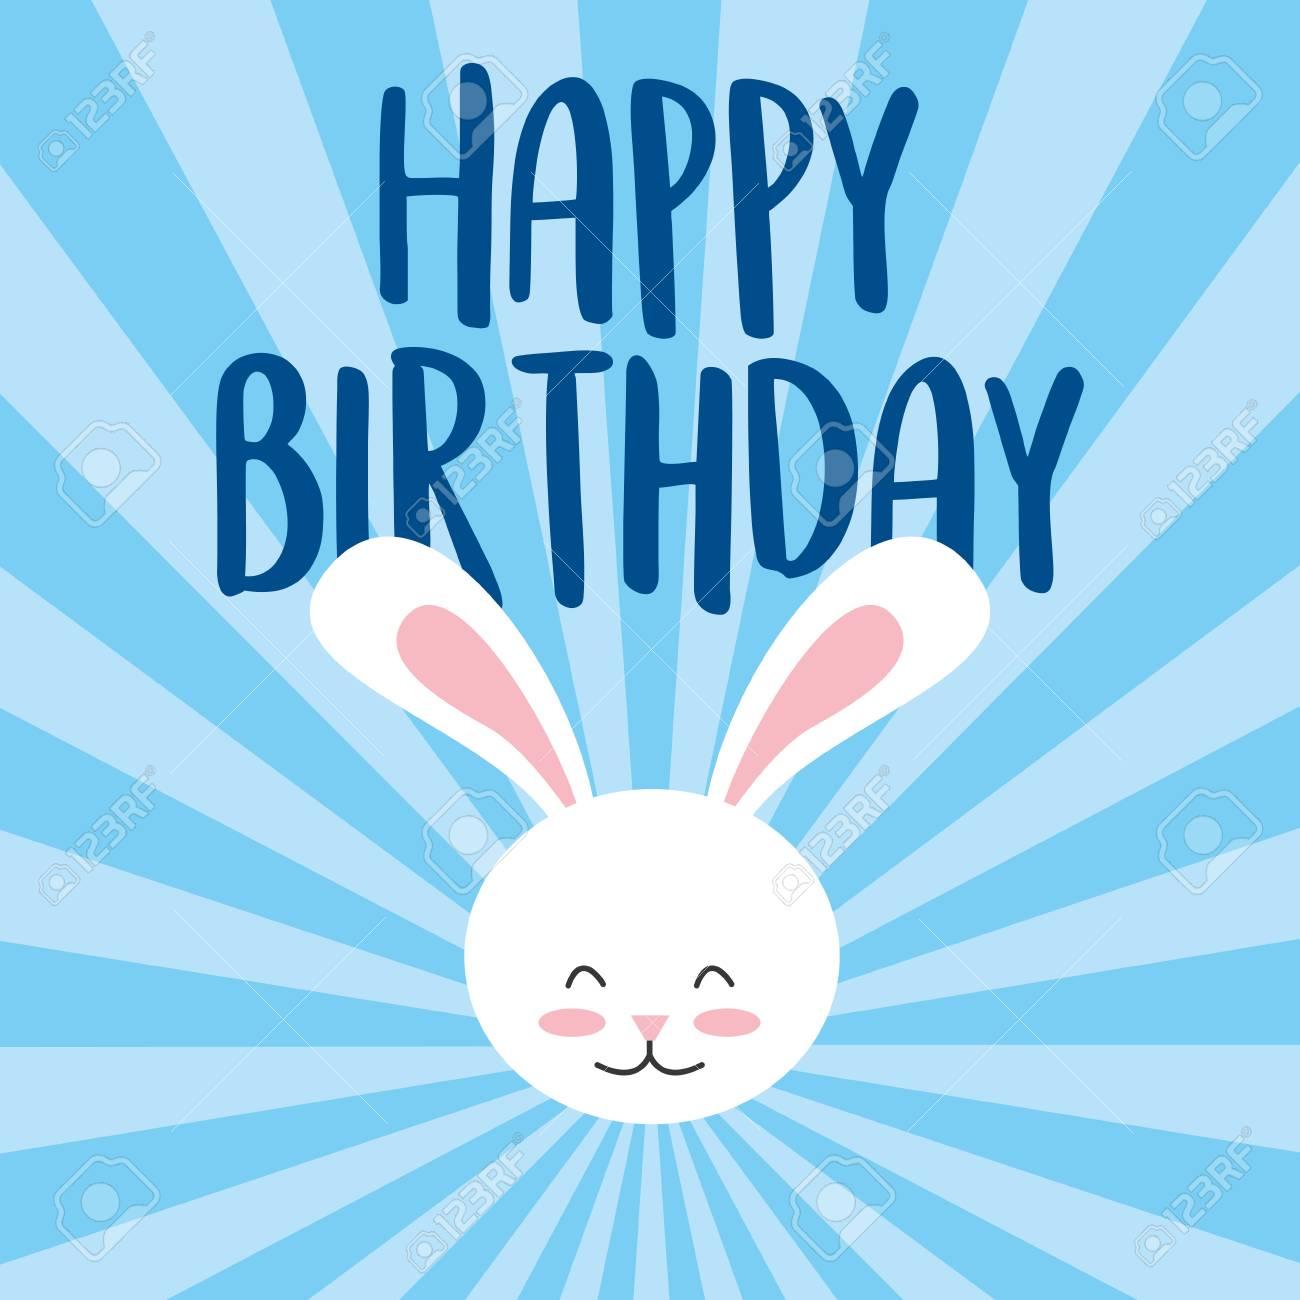 Happy Birthday Card Invitation Celebration Cute Rabbit Head Vector Illustration Stock